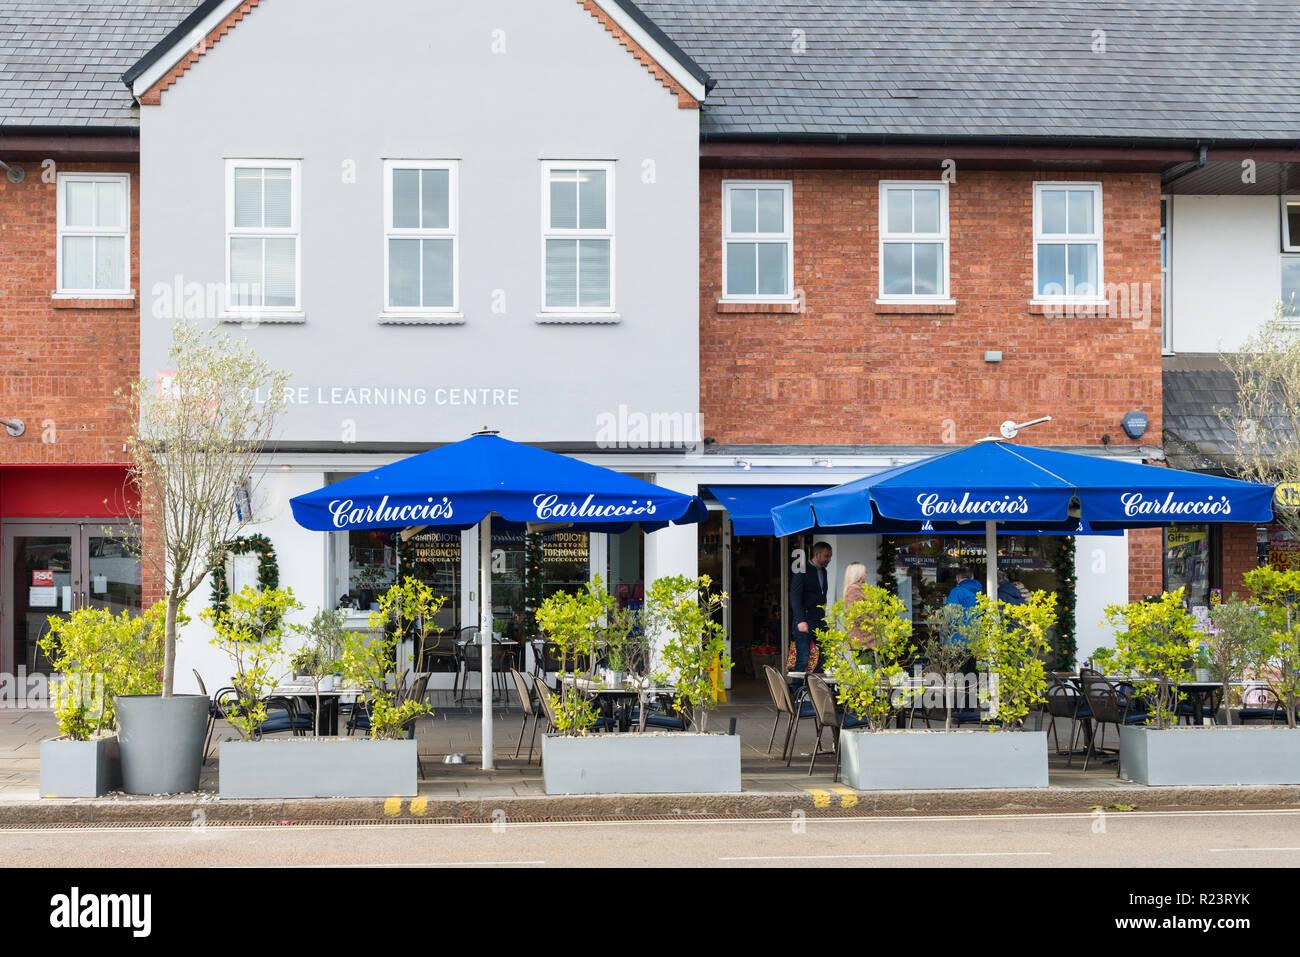 Large blue umbrellas outside Carluccio's Italian restaurant in Stratford-upon-Avon, Warwickshire - Stock Image